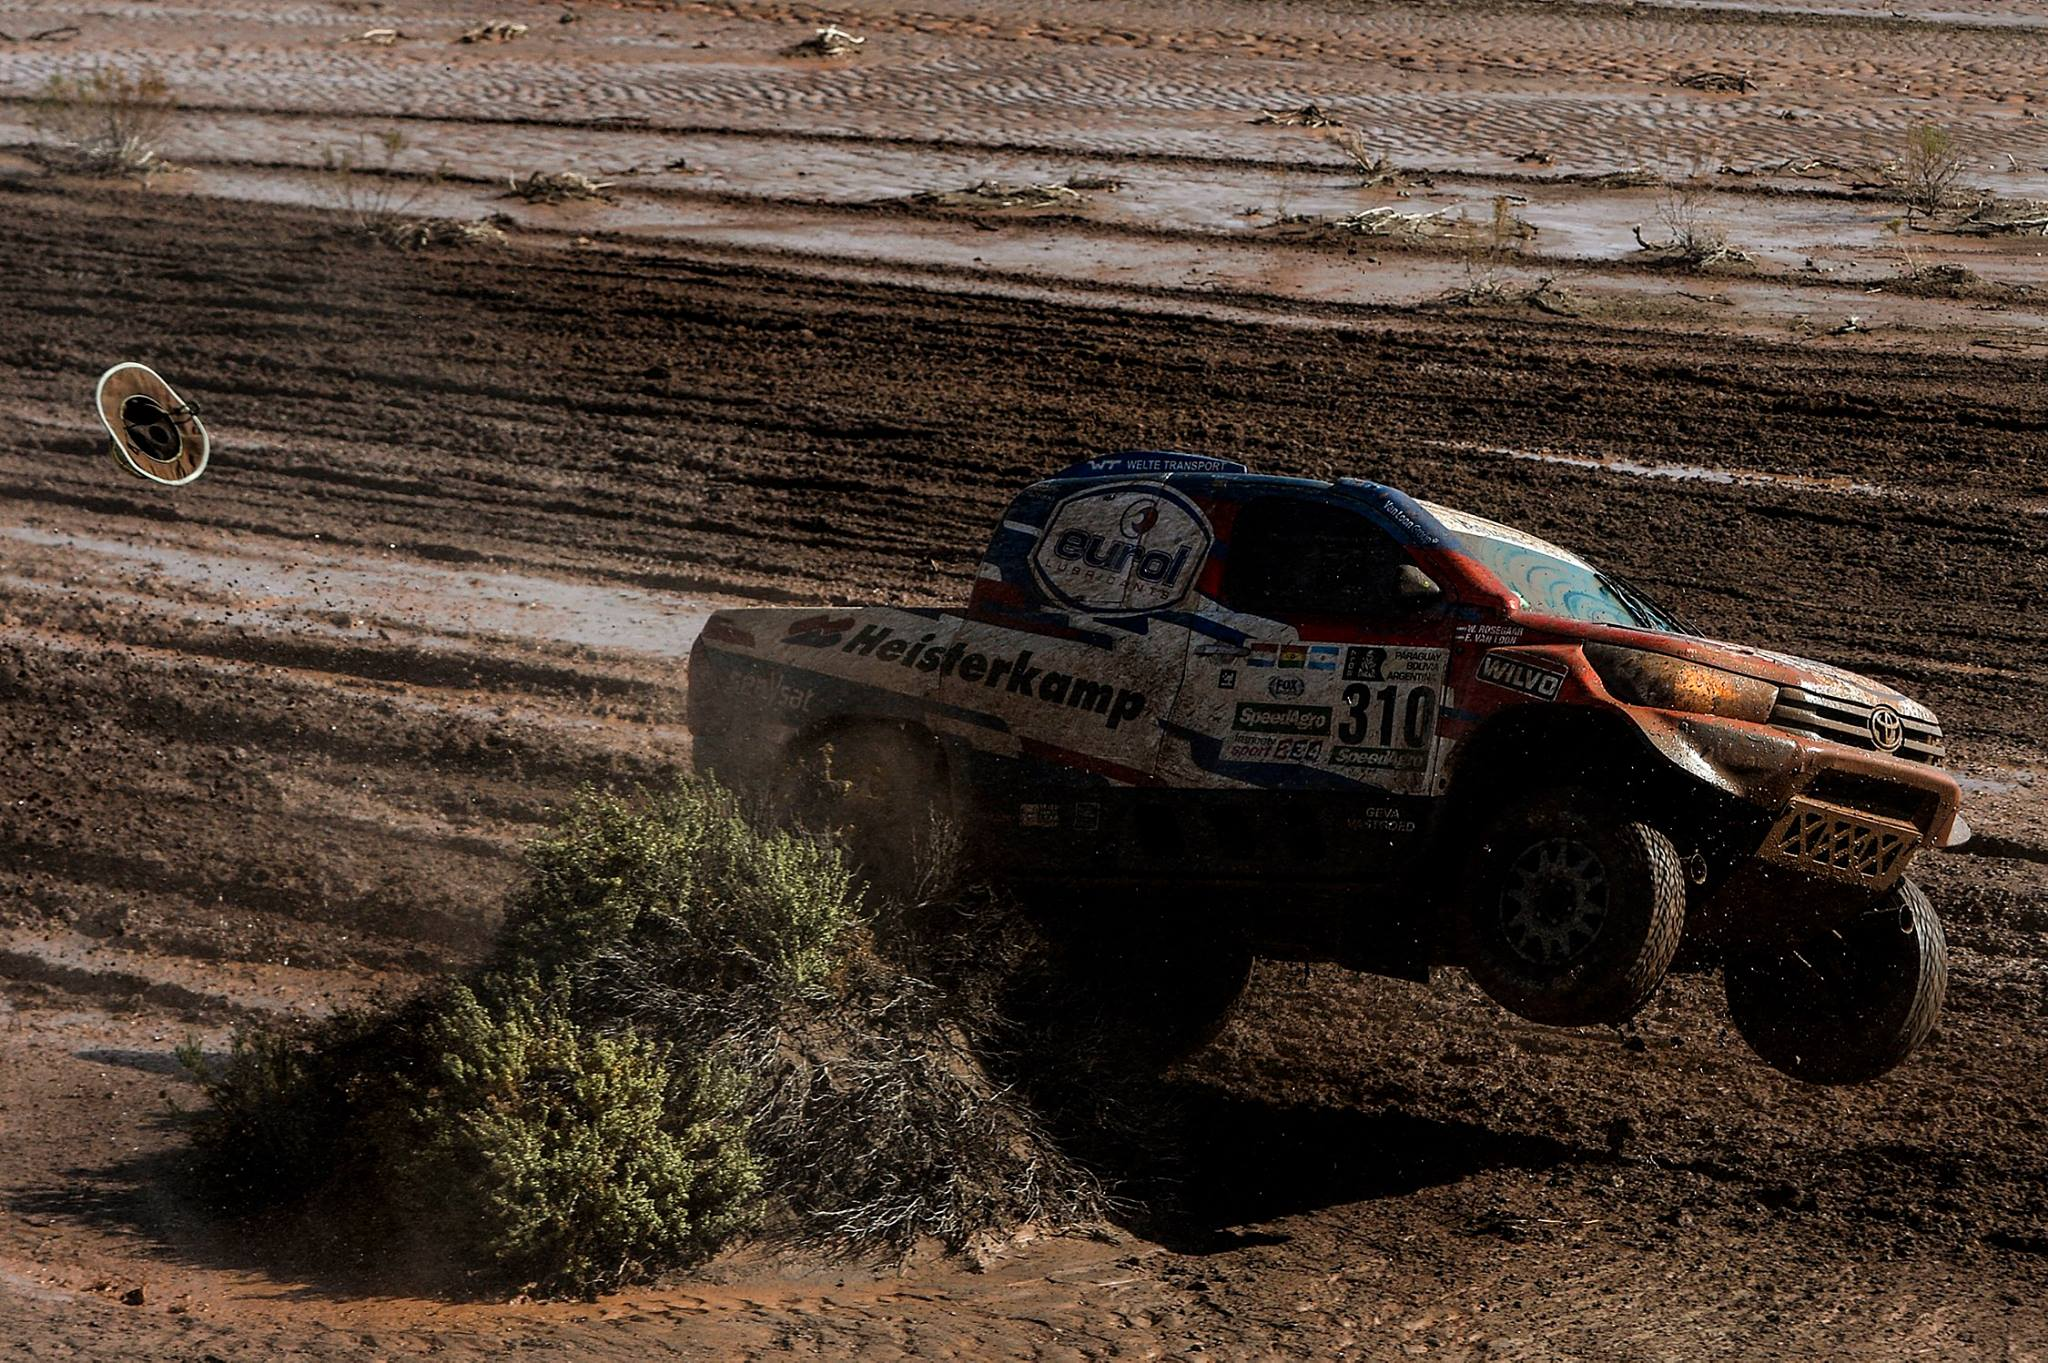 Dakar 2017: trionfo Peterhansel, dominio Peugeot! Vittoria storica di Sunderland nelle moto